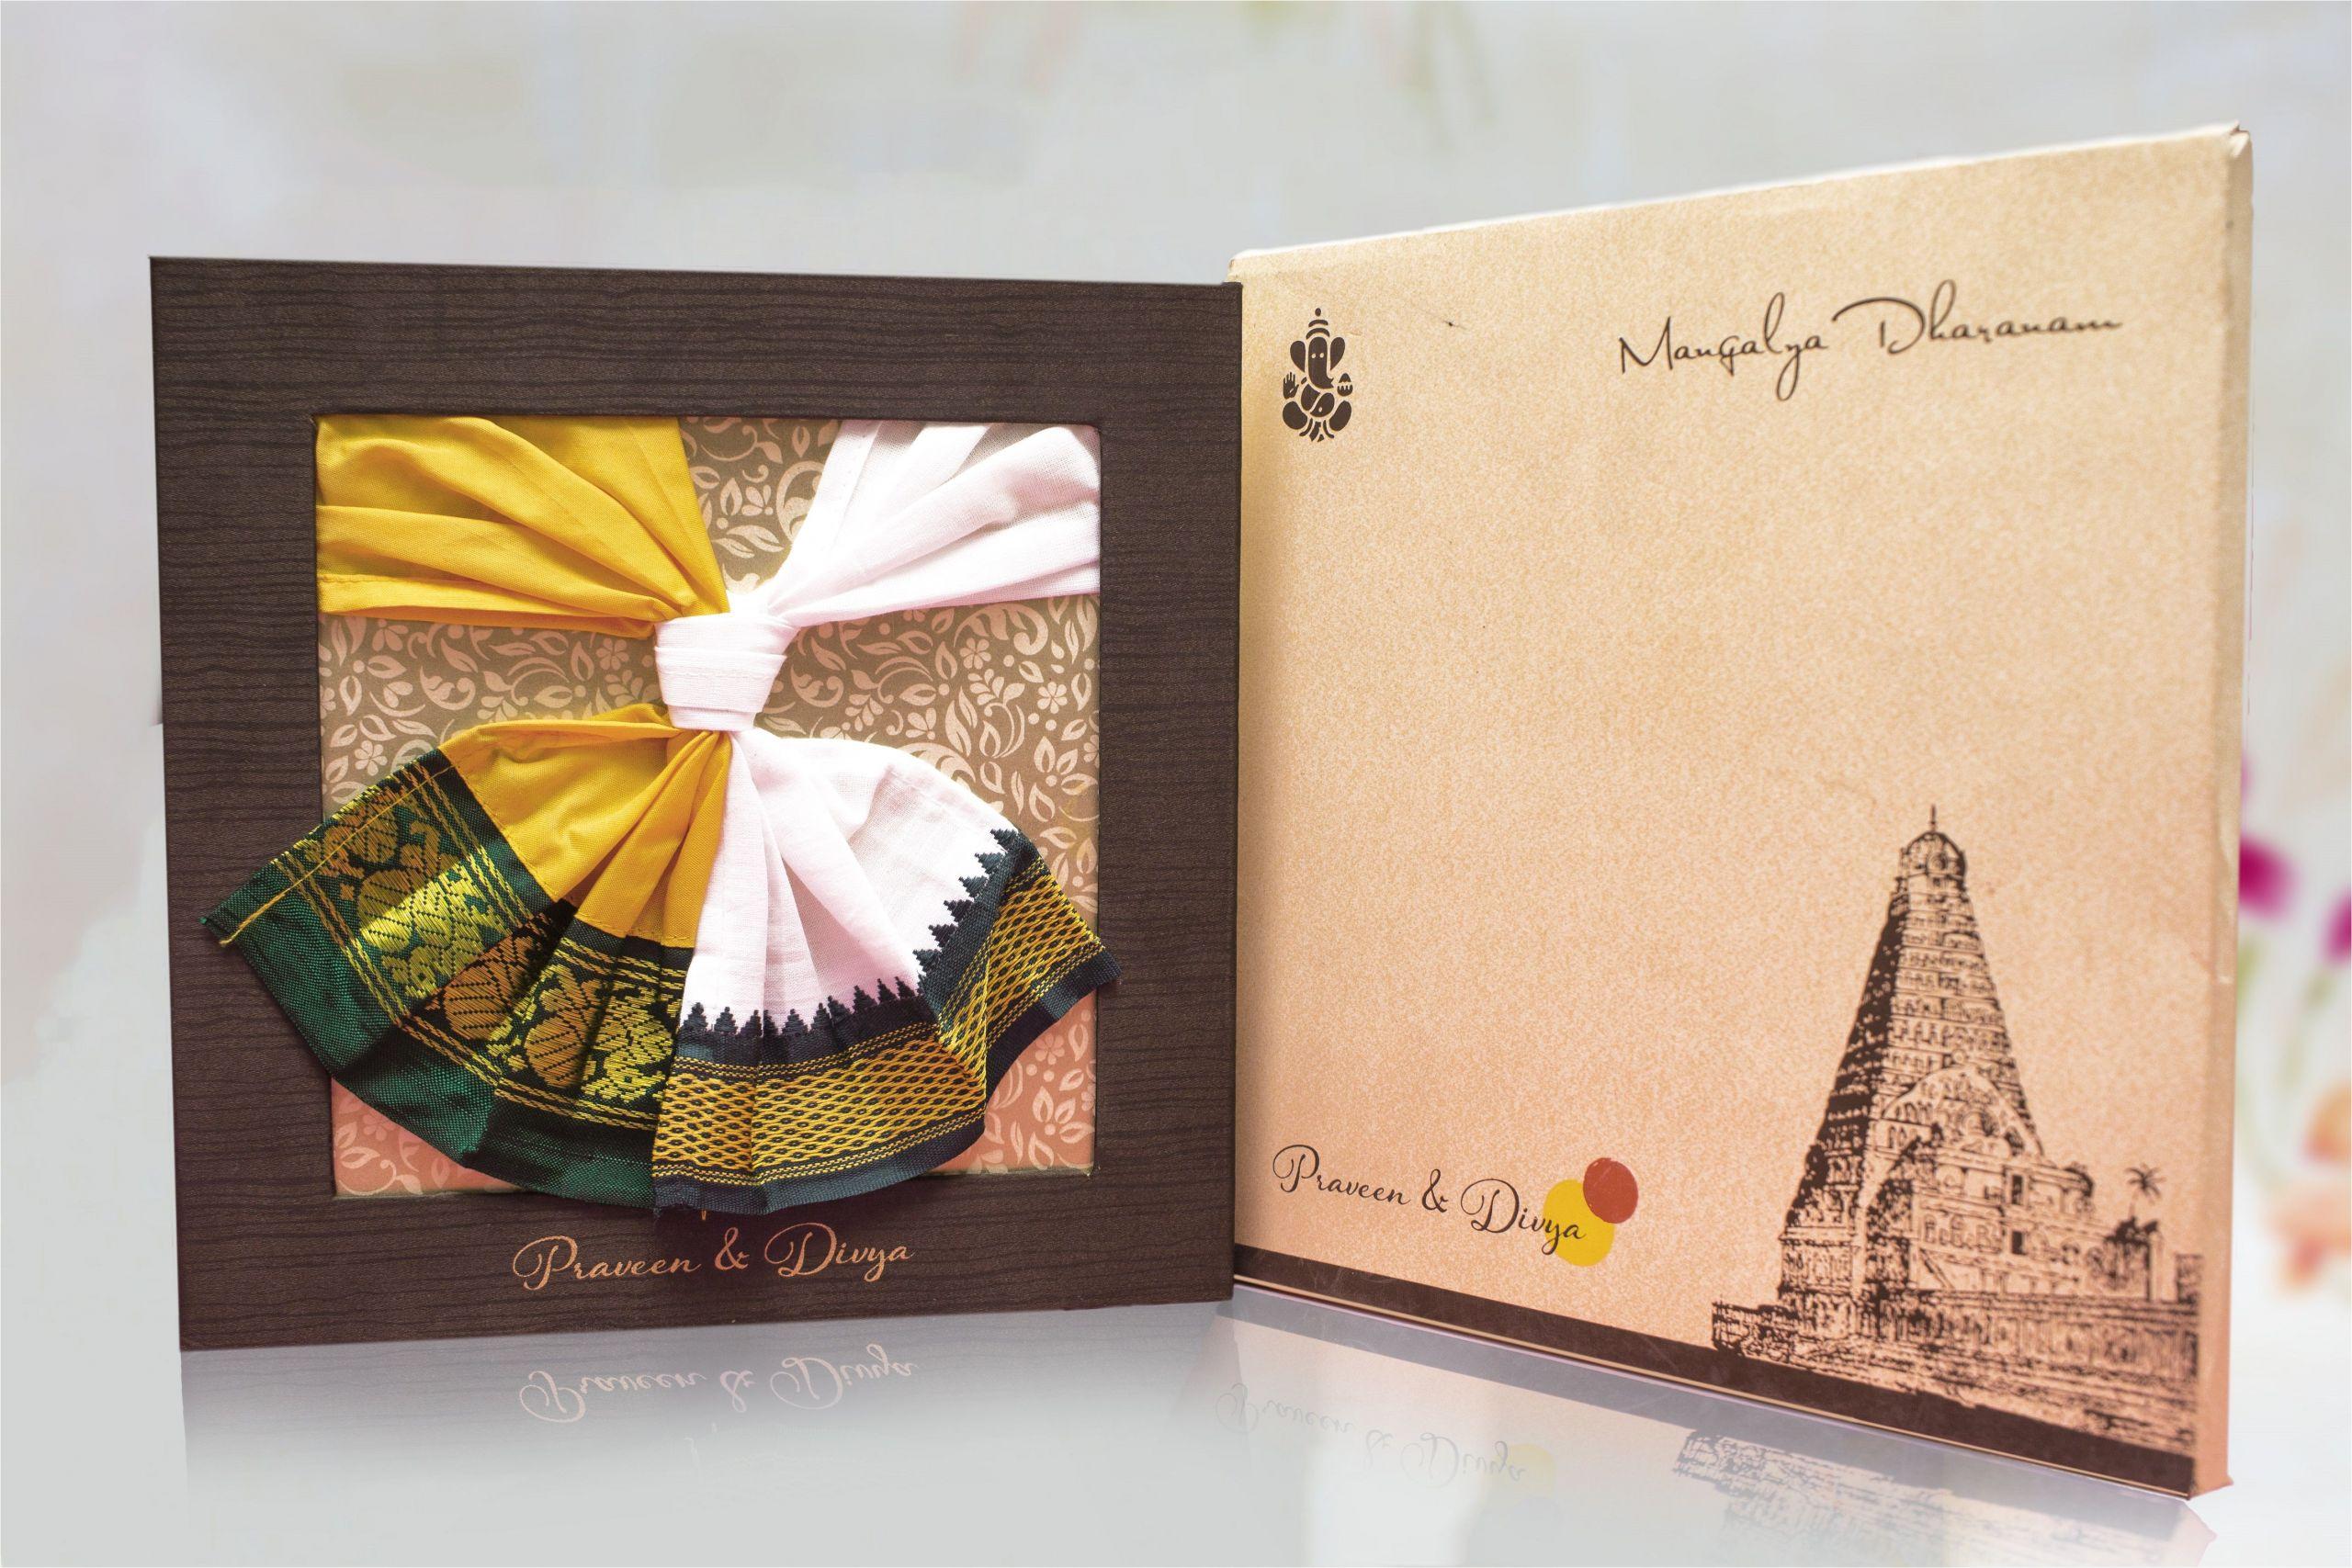 Modern Indian Wedding Card Designs Indian Creative Hindu Wedding Invitation which Brings the